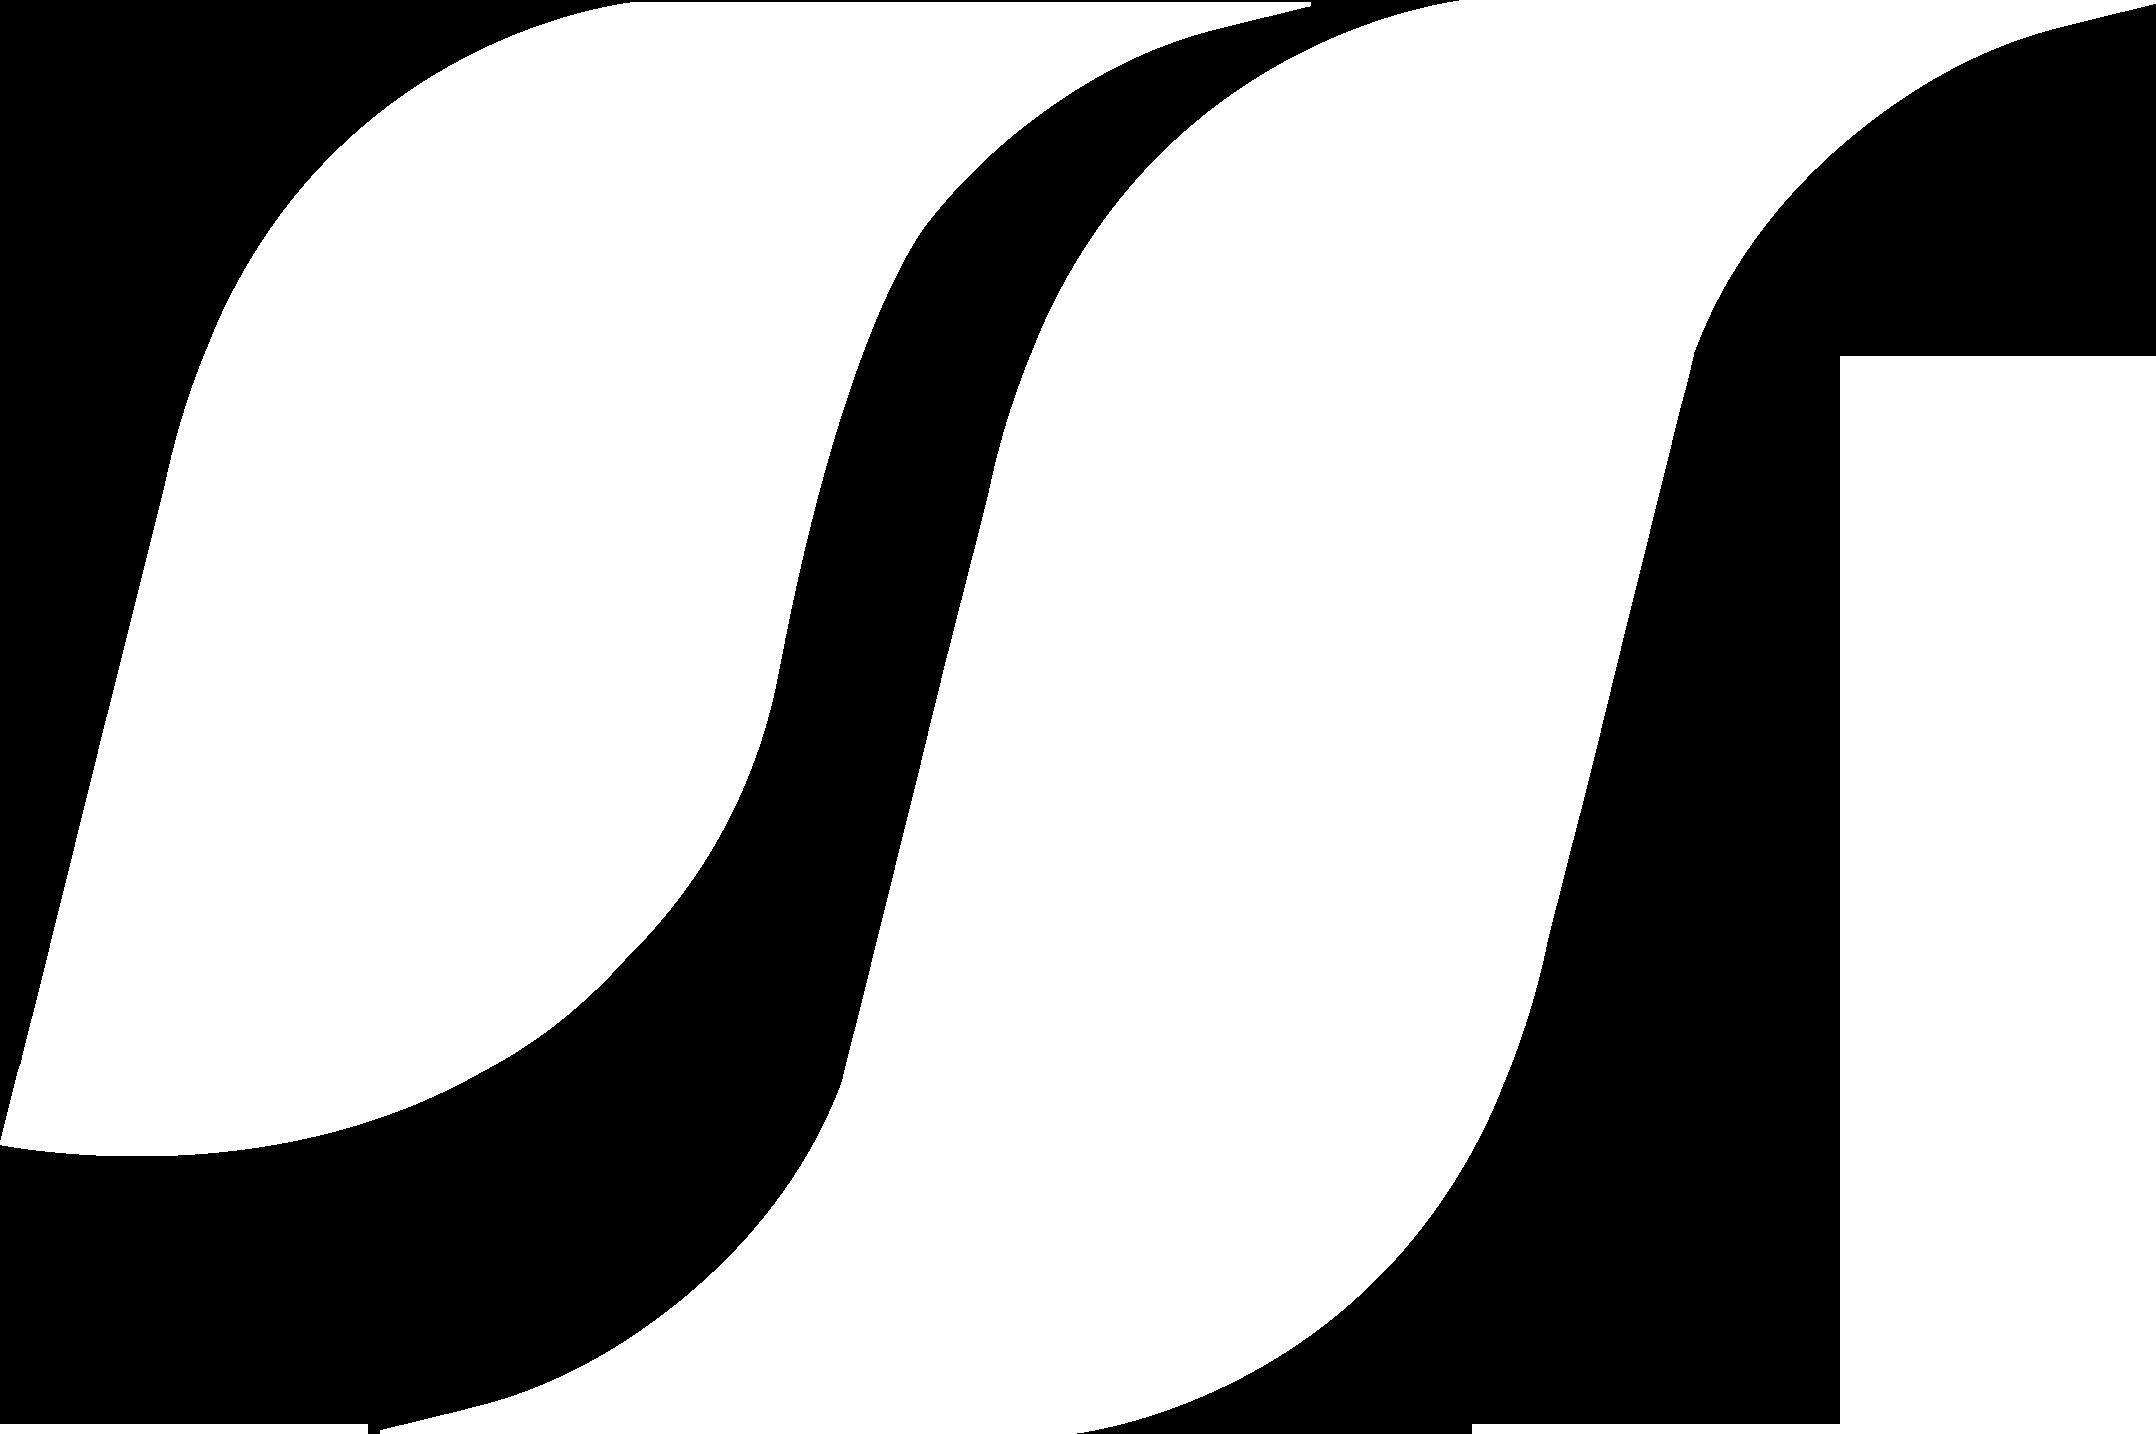 FlowTronix-logo-shape